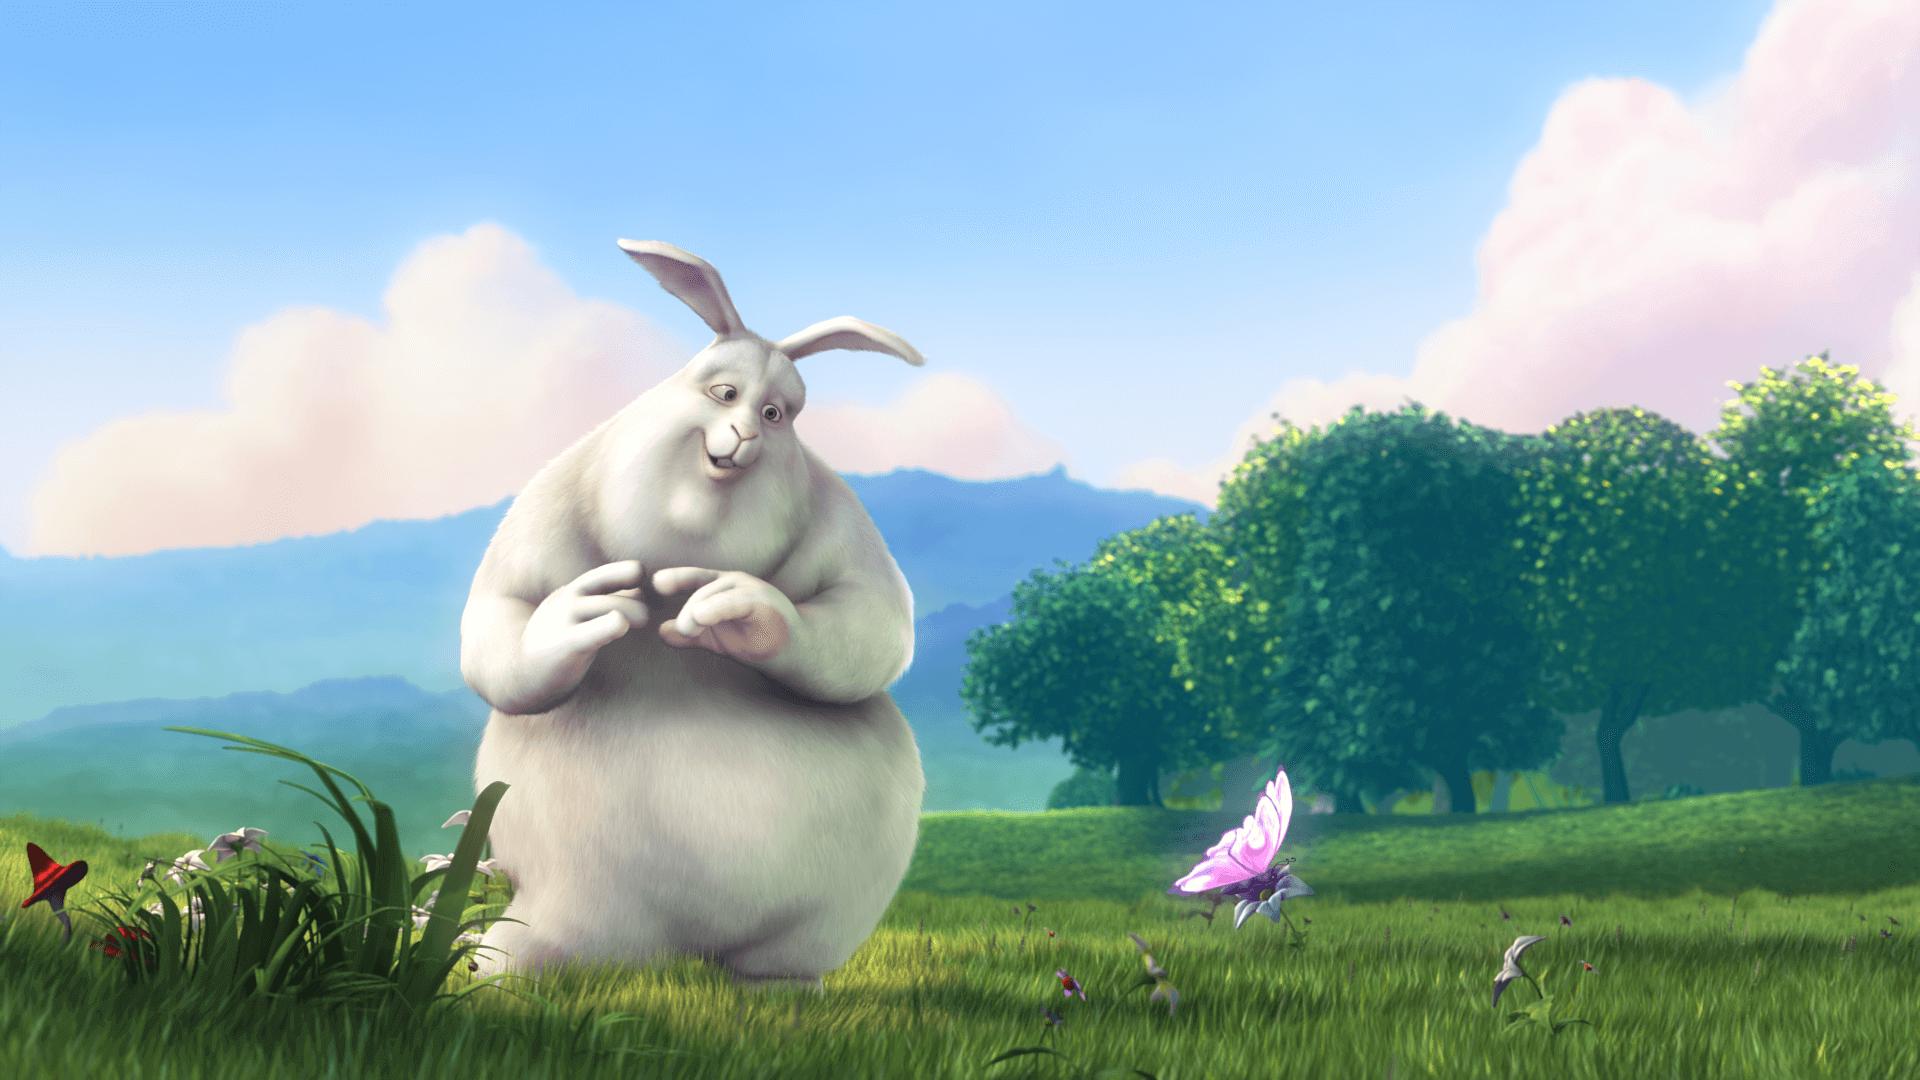 Big Black Bunny Fullscreen Lightbox